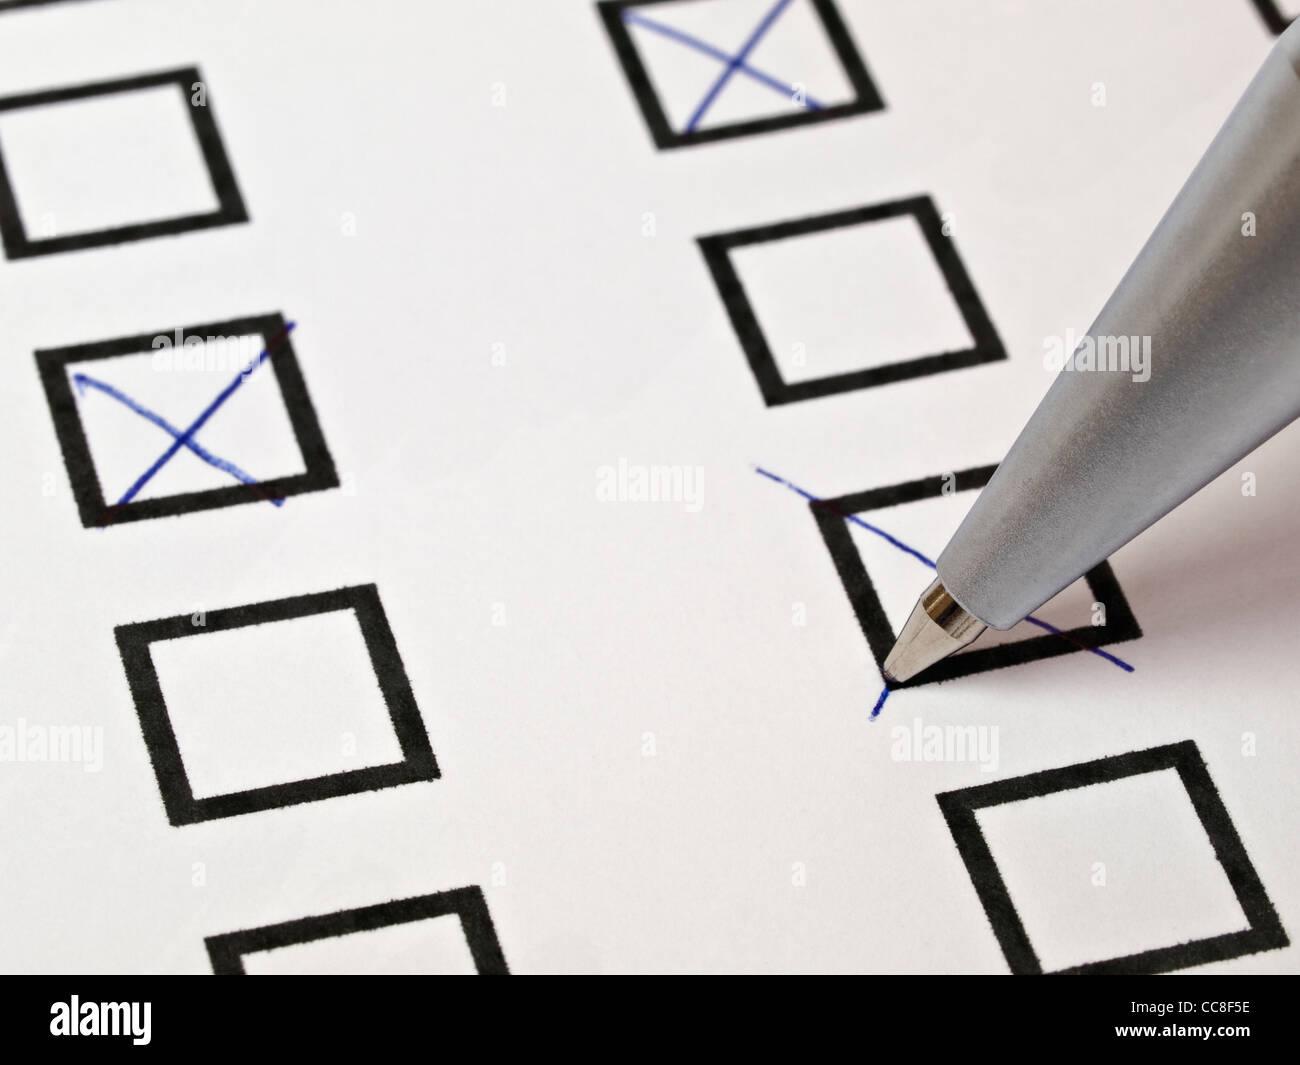 viele Kästchen werden mit einem Kugelschreiber angekreuzt | many small boxes are marked with a cross with a ballpoint Stock Photo